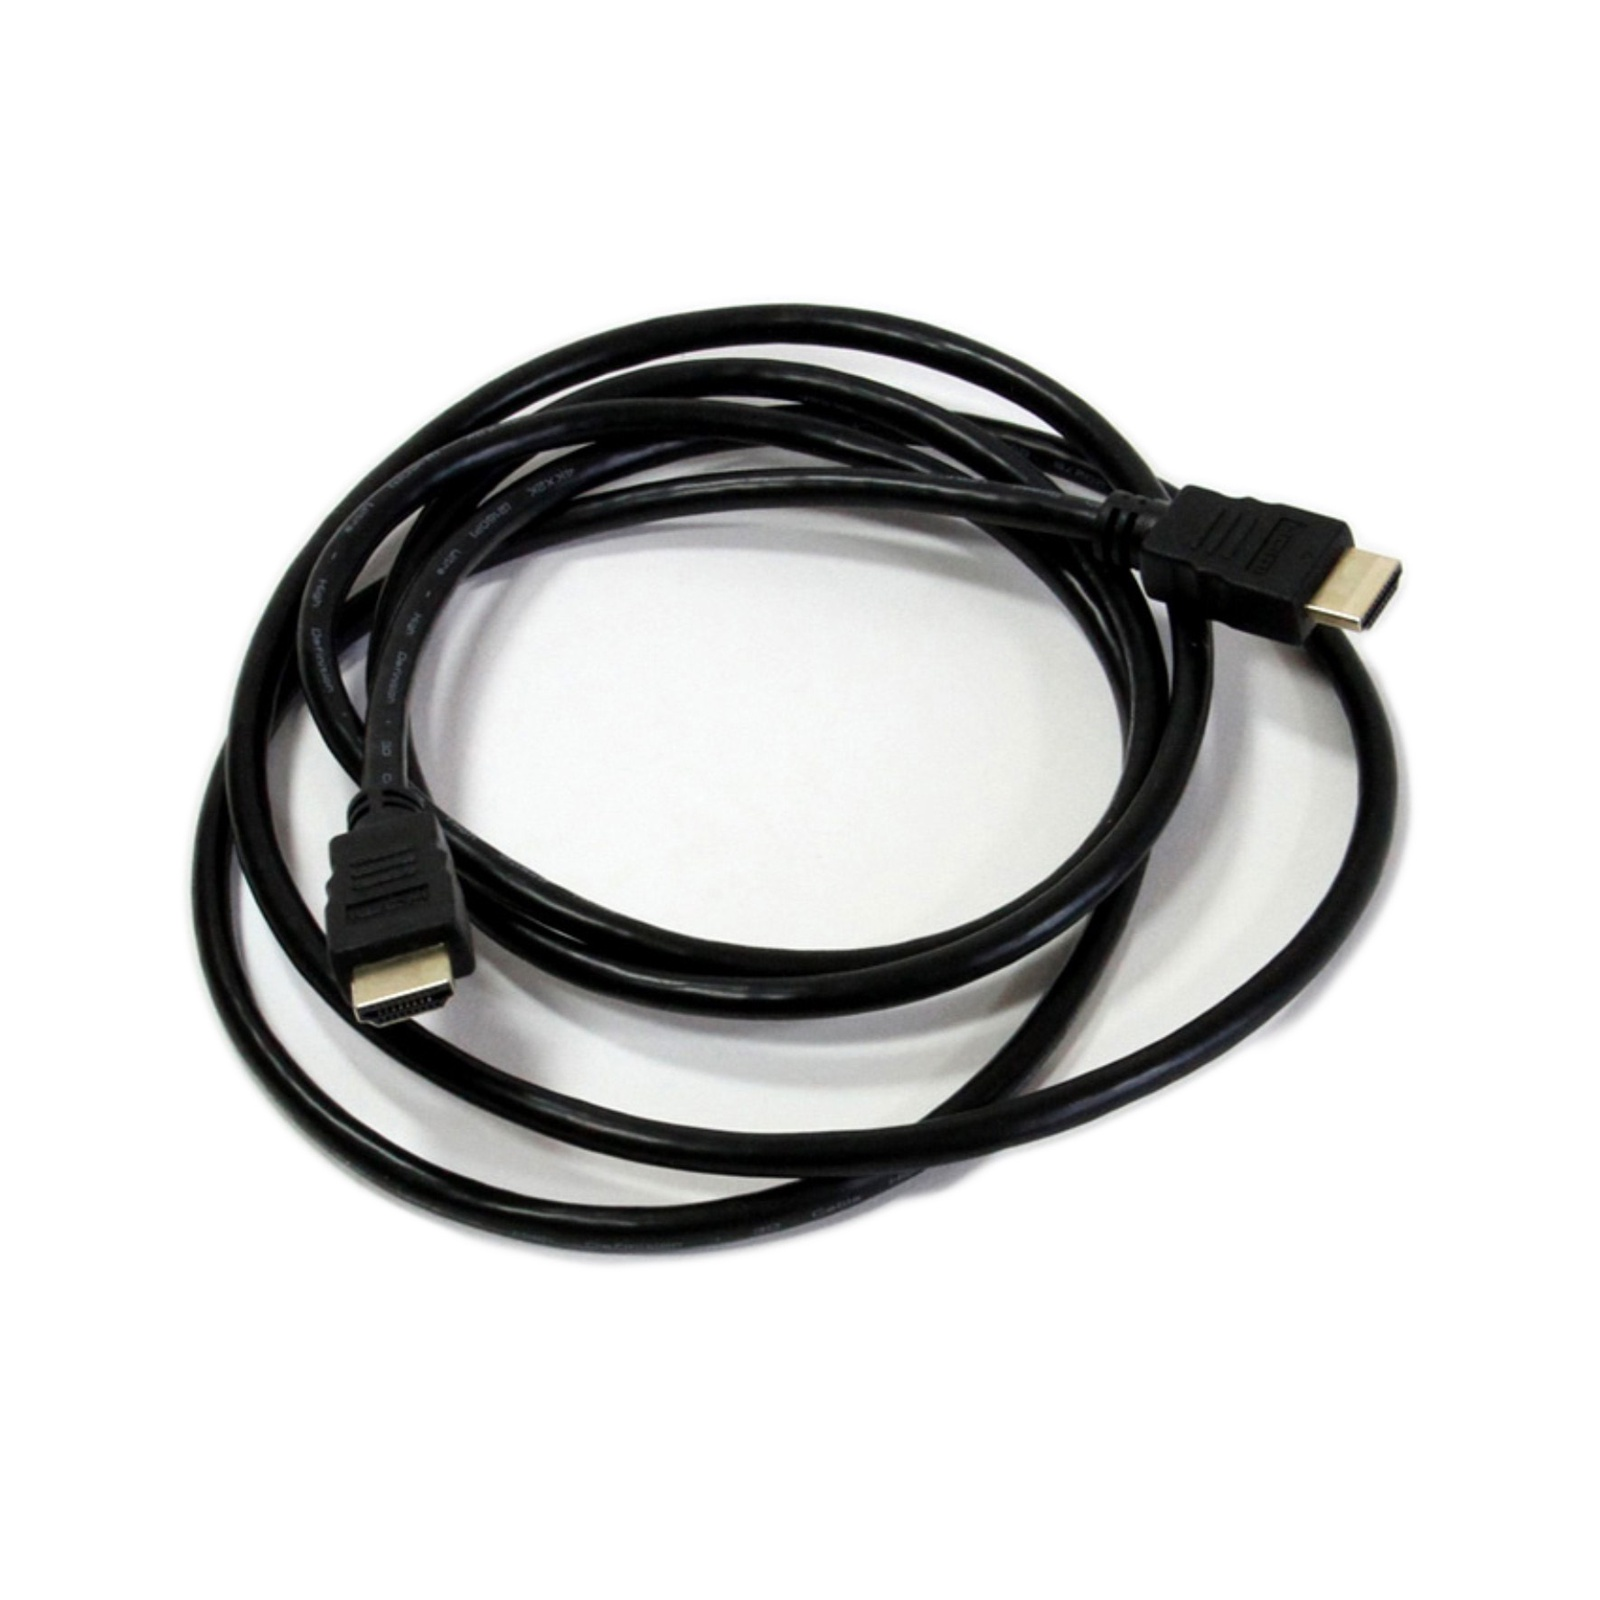 Кабель TELECOM HDMI-19M ― HDMI-19M ver 2.0+3D Ethernet, 2m TCG200-2M, TCG200-2M игла для звукоснимателя ortofon 2m blue stylus